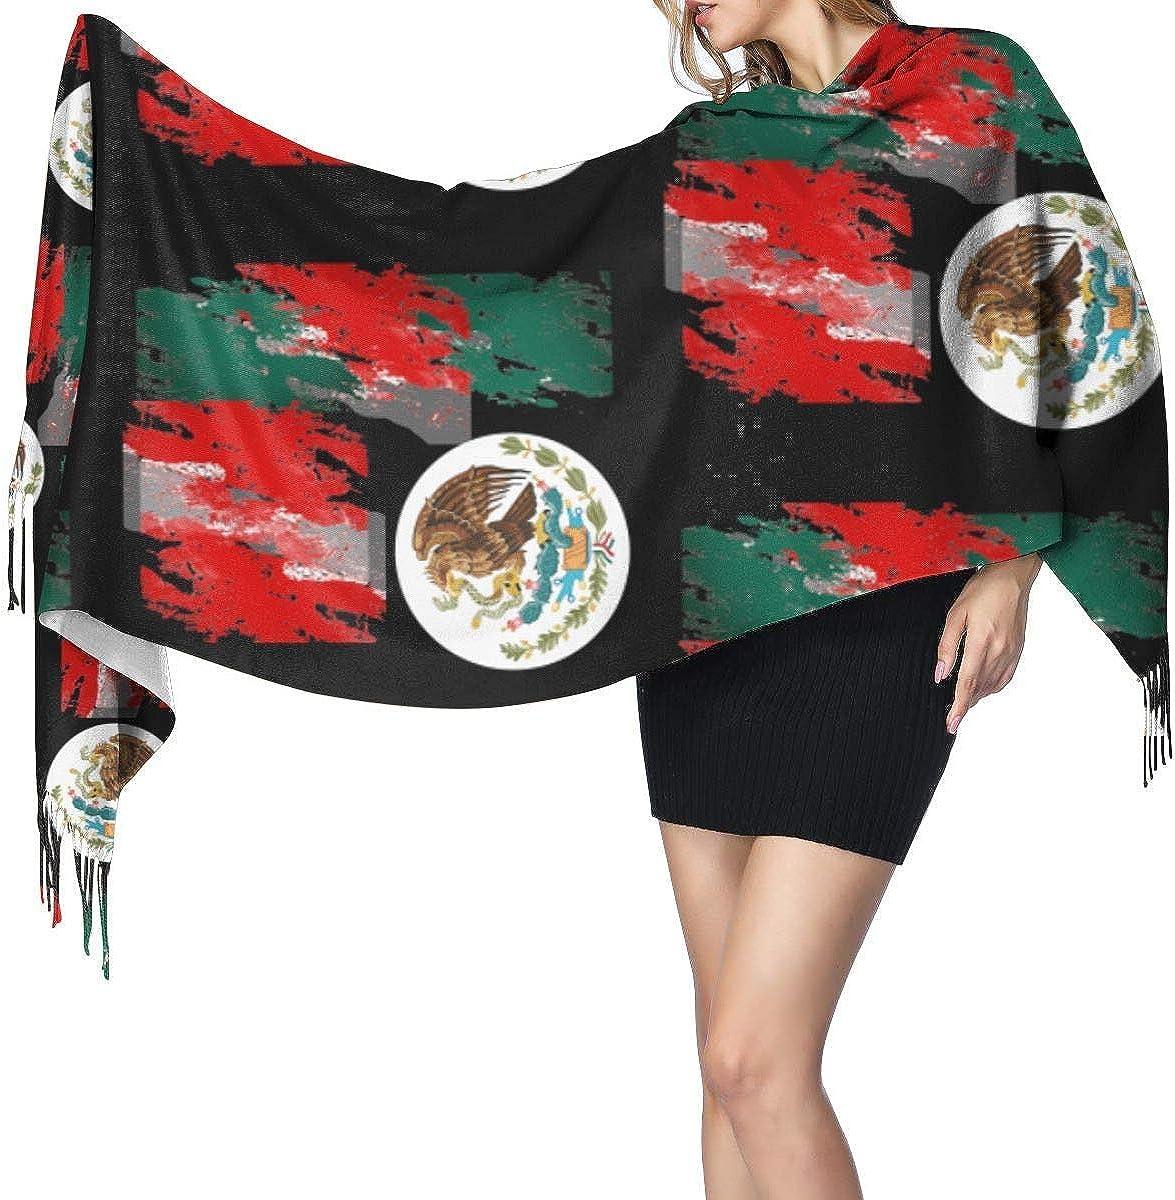 HNJZ-GS Bandera de México Pintura colorida Mujeres